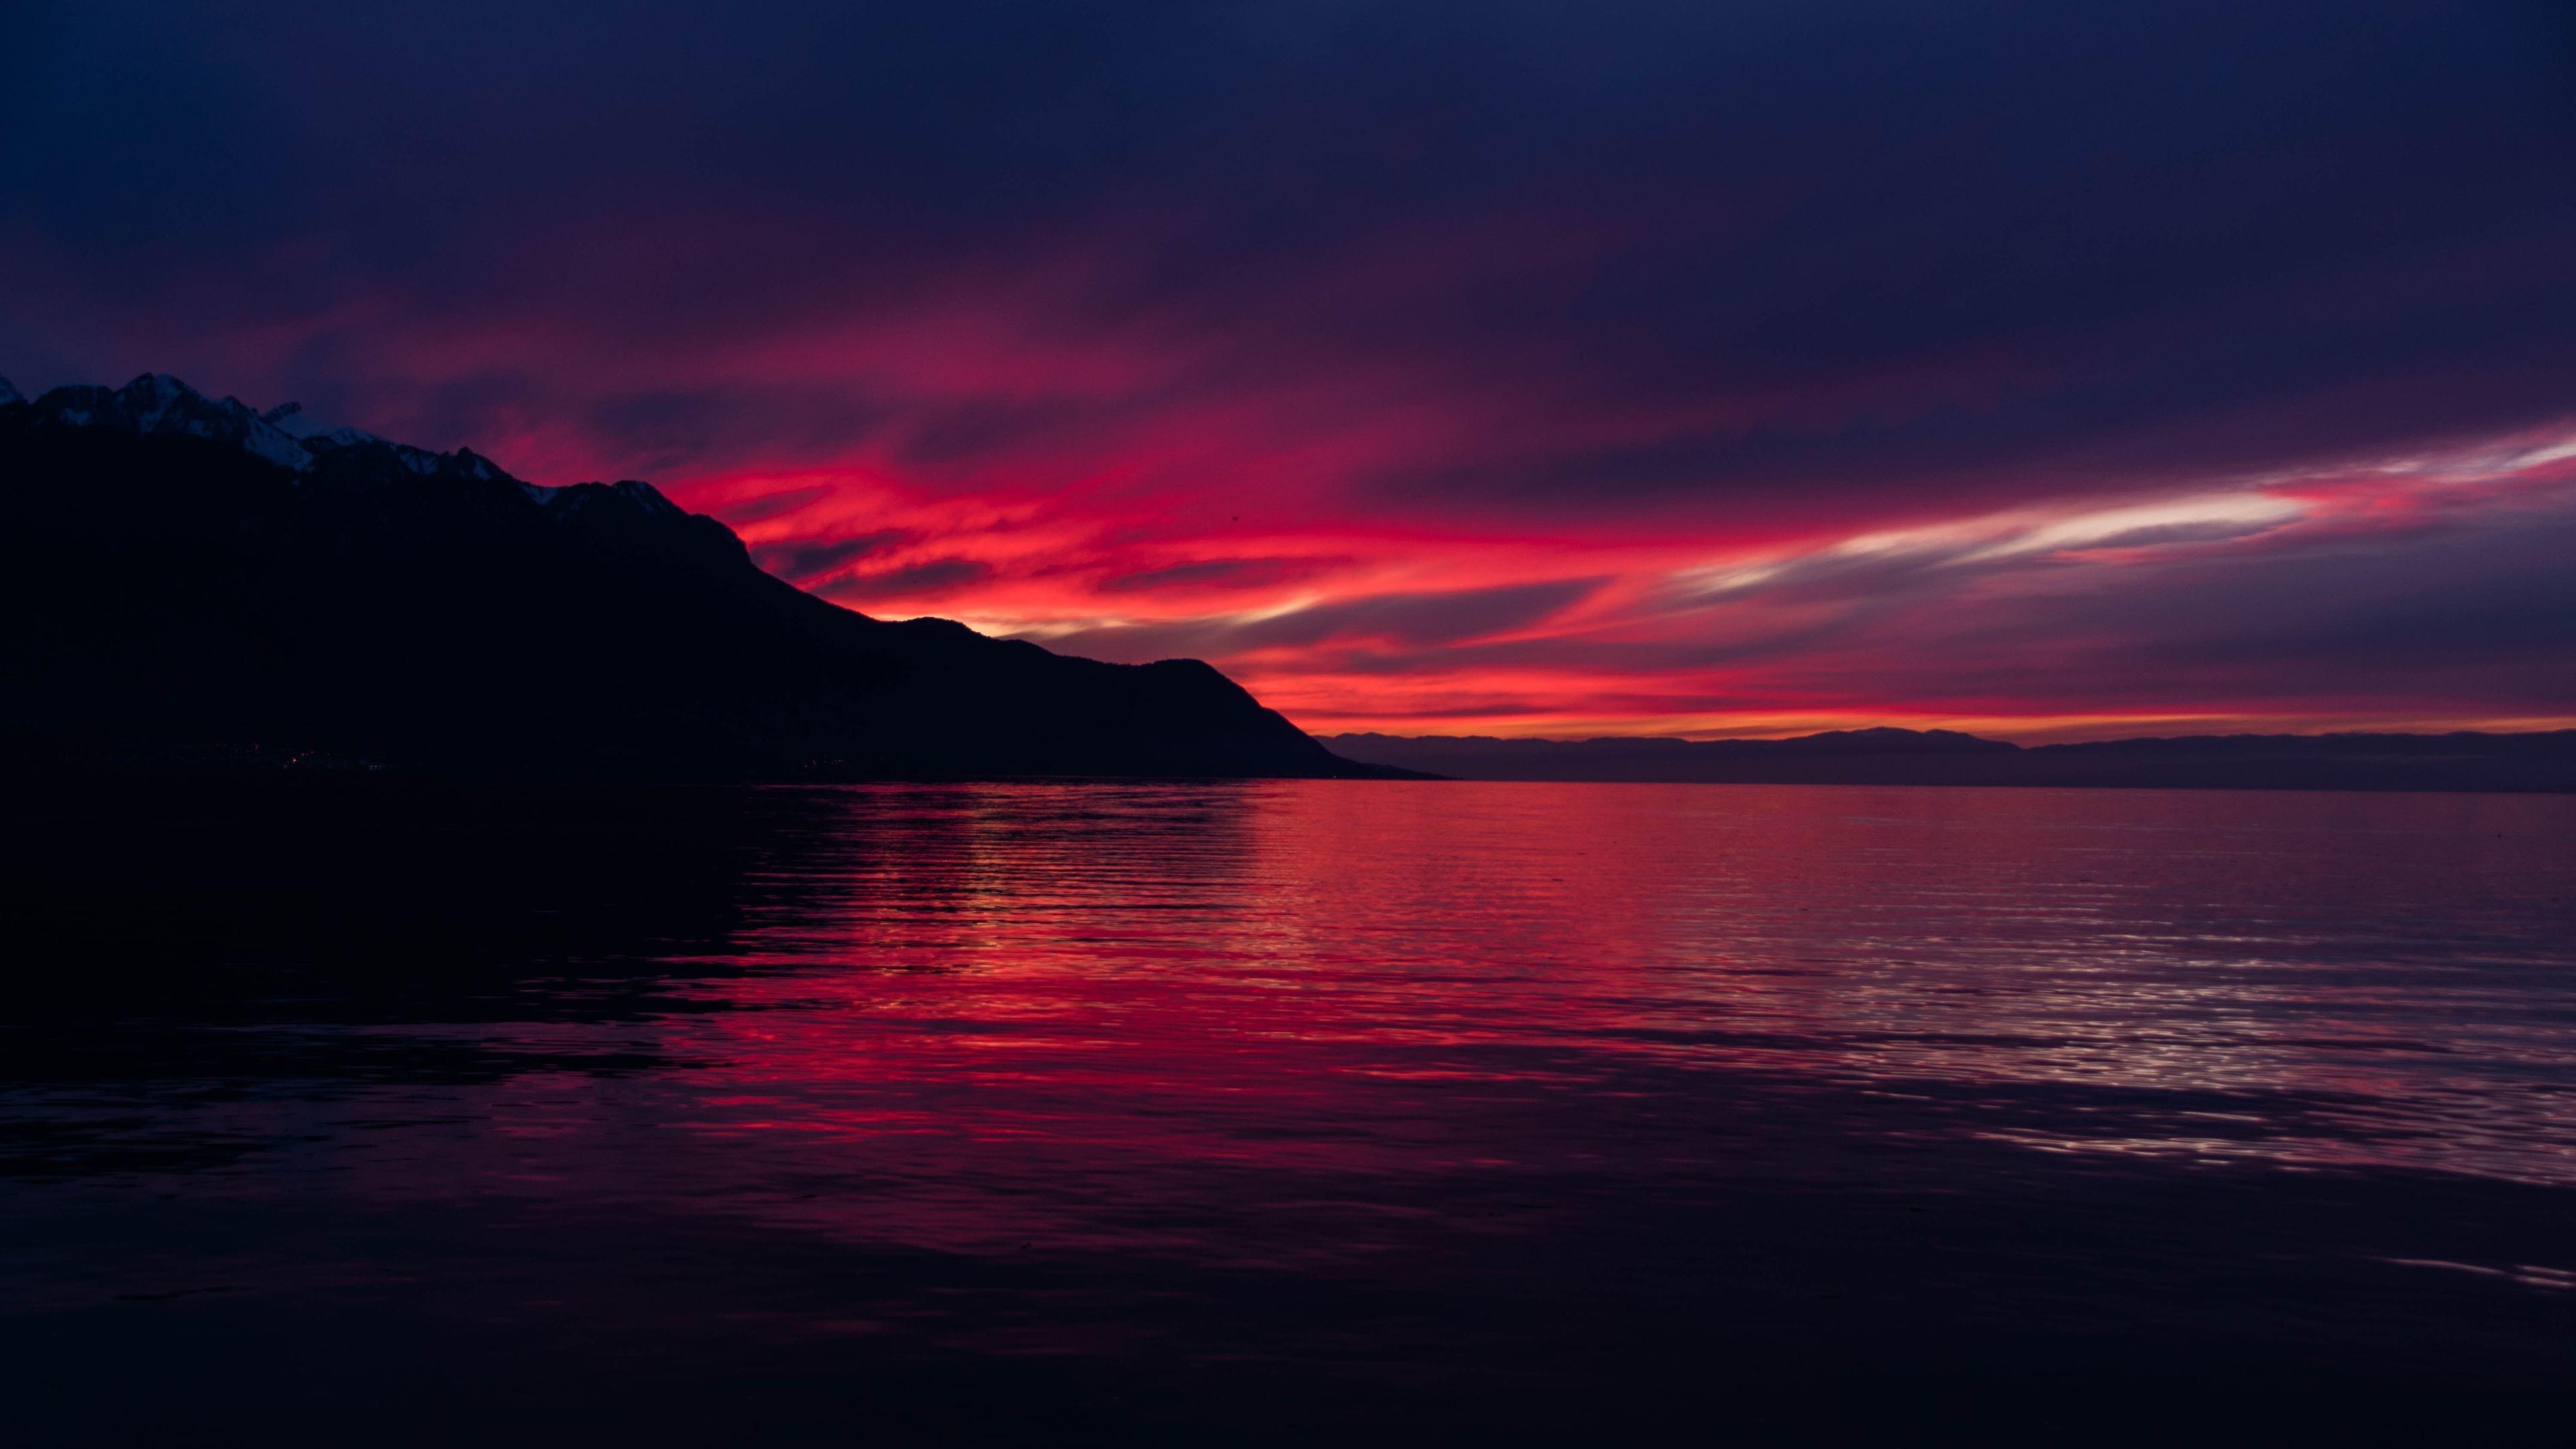 4k Dark Sunset Wallpaper Hd Nature 4k Wallpapers Images Photos